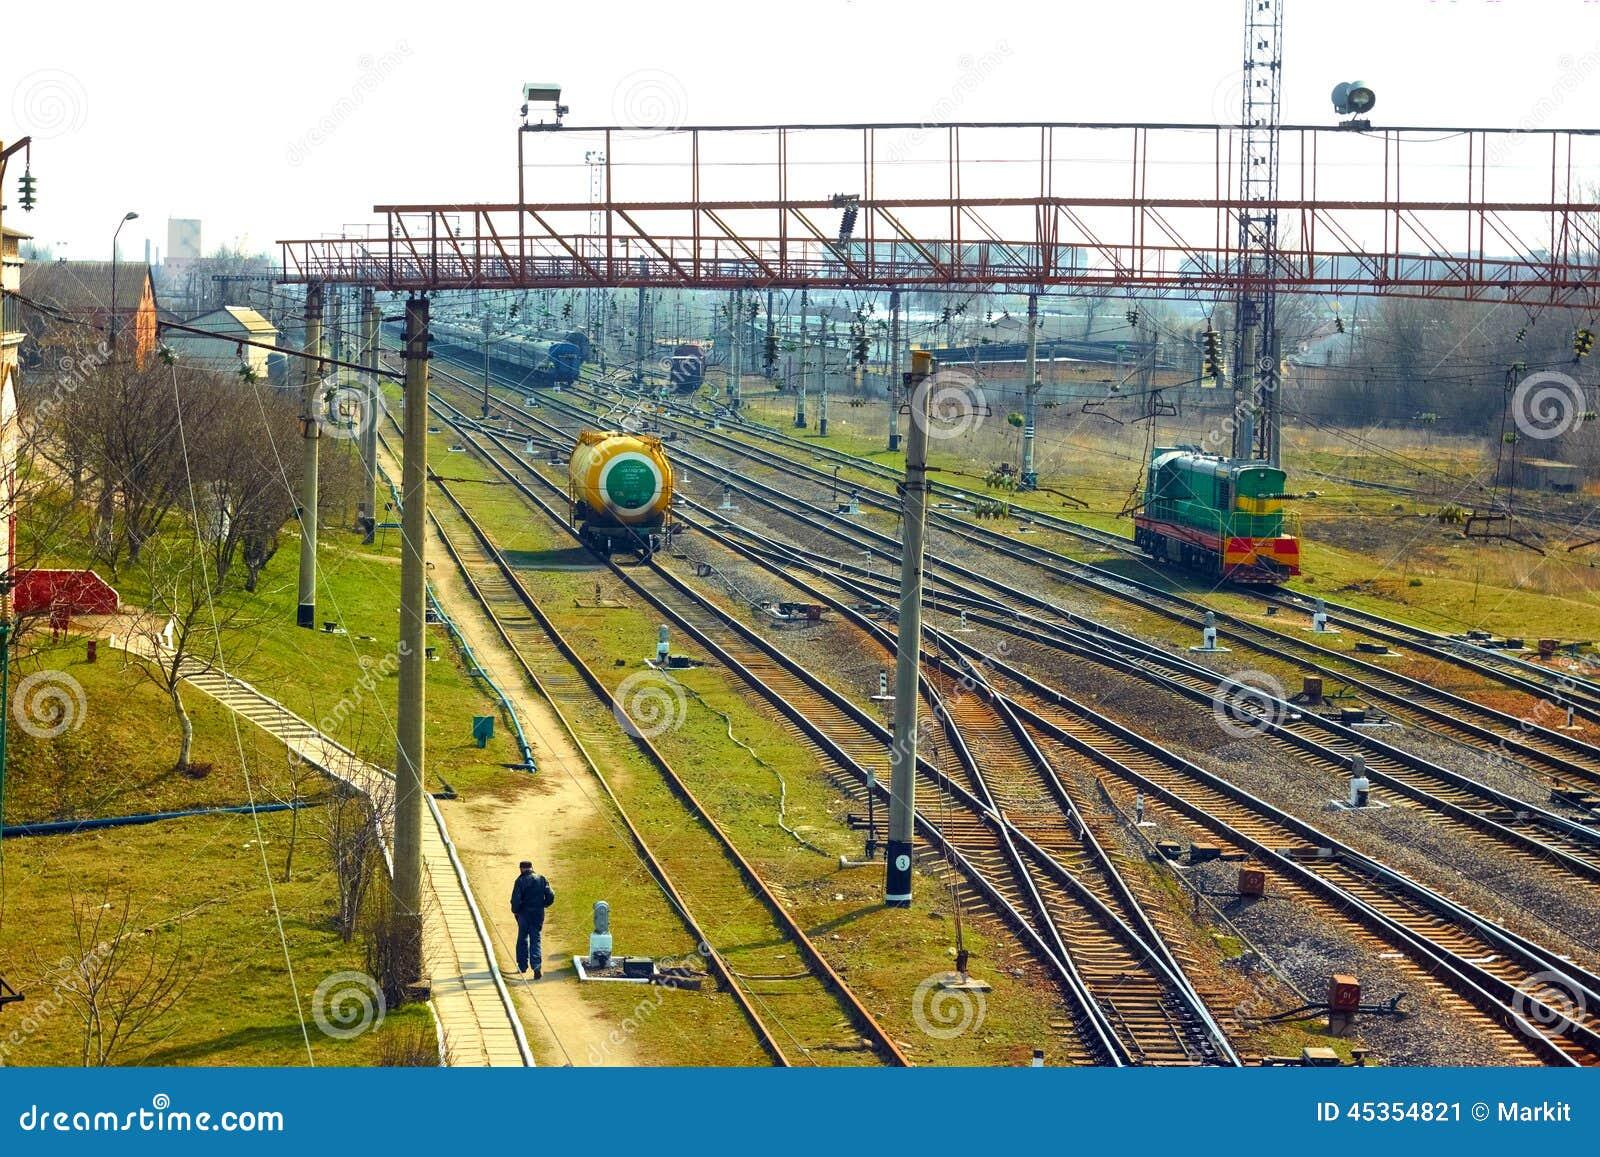 Infrastructure près de gare ferroviaire dans Khmelnytsky, Ukraine